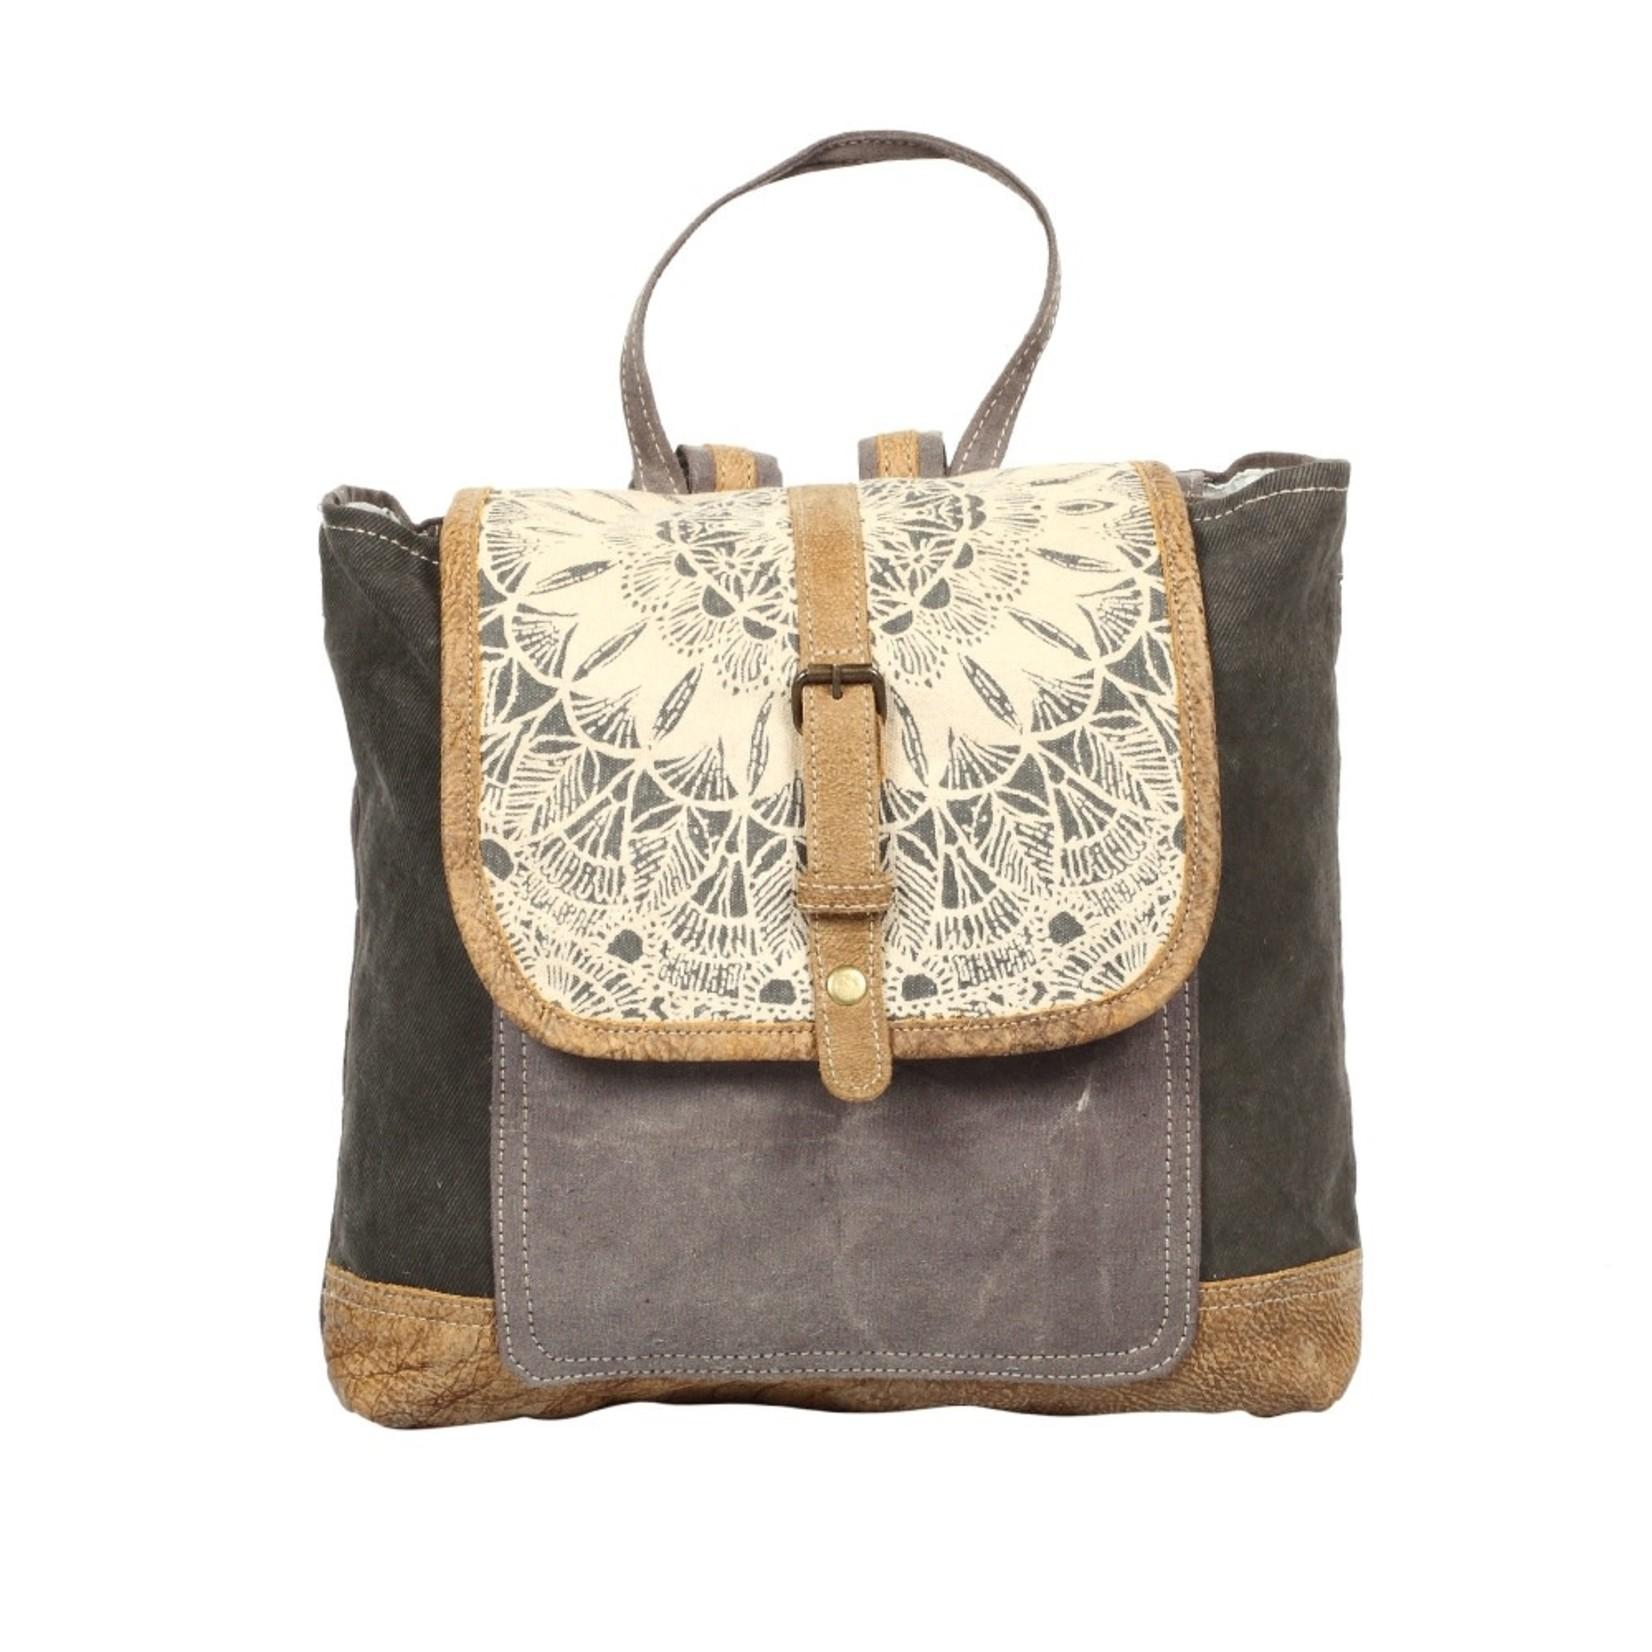 Myra Bags S-1287 Daisy Delight Backpack Bag